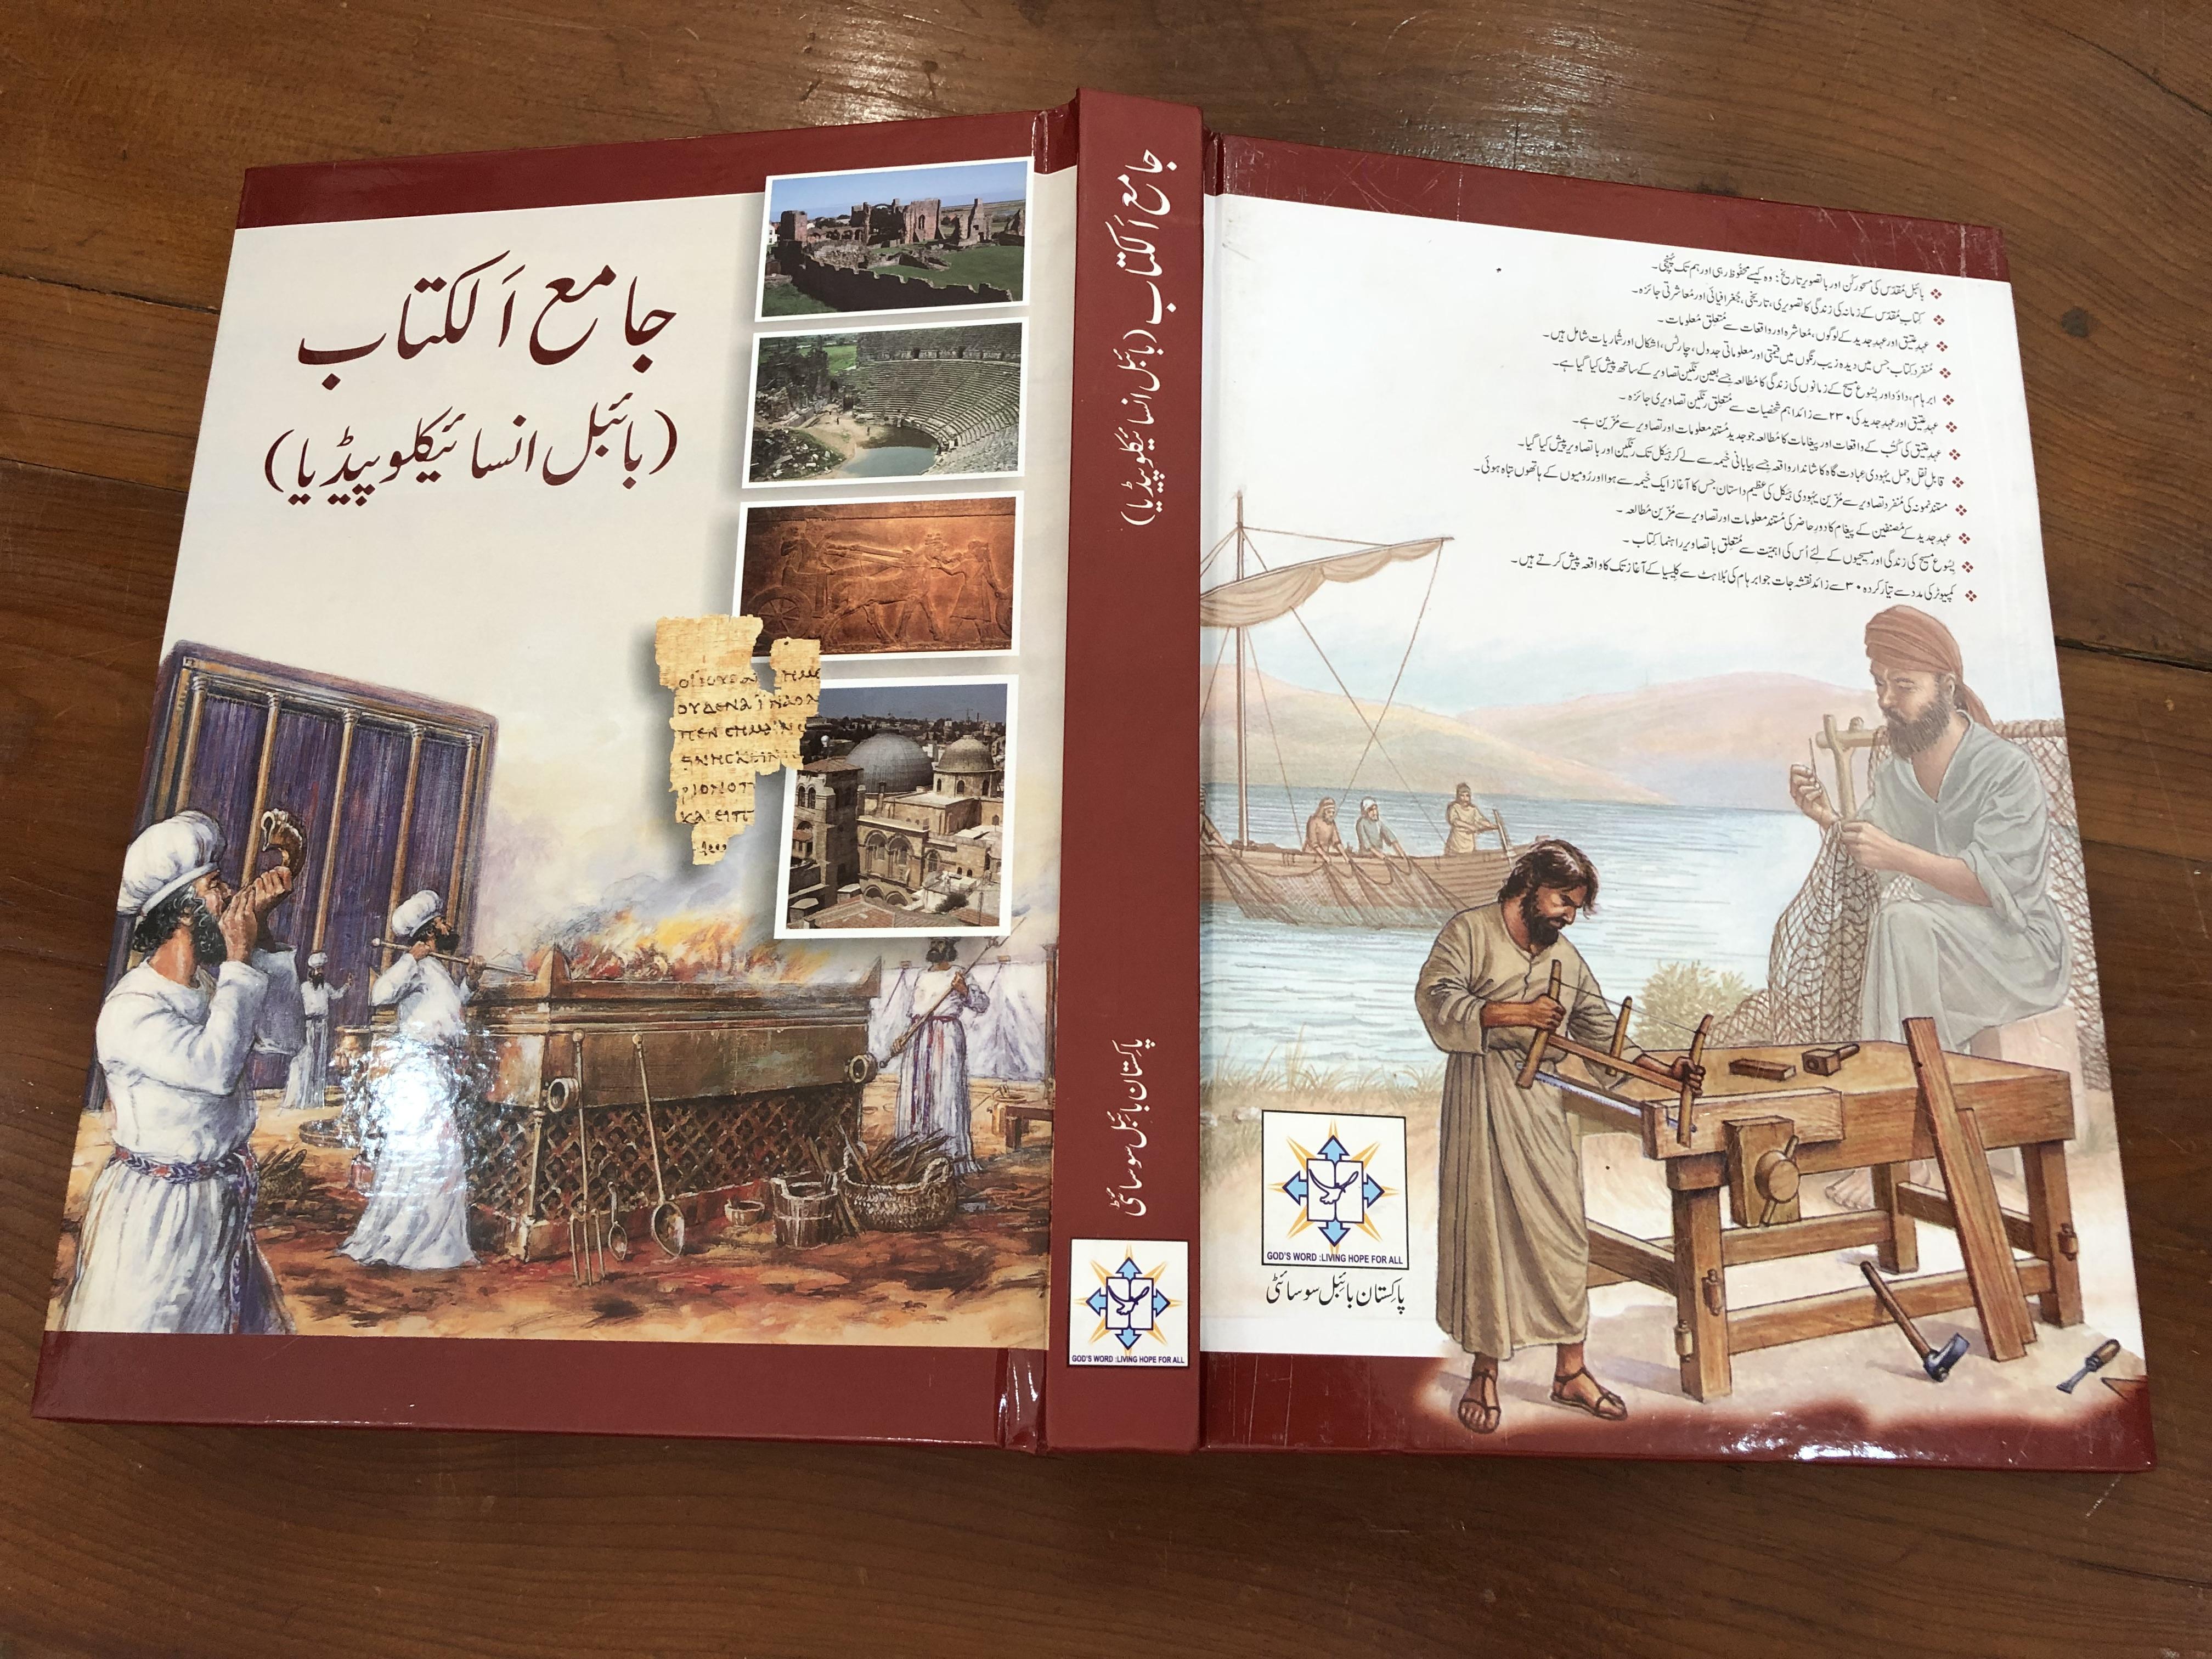 the-bible-encyclopedia-in-urdu-language-translated-from-12-english-titles-pakistan-bible-society-2018-hardcover-18-.jpg